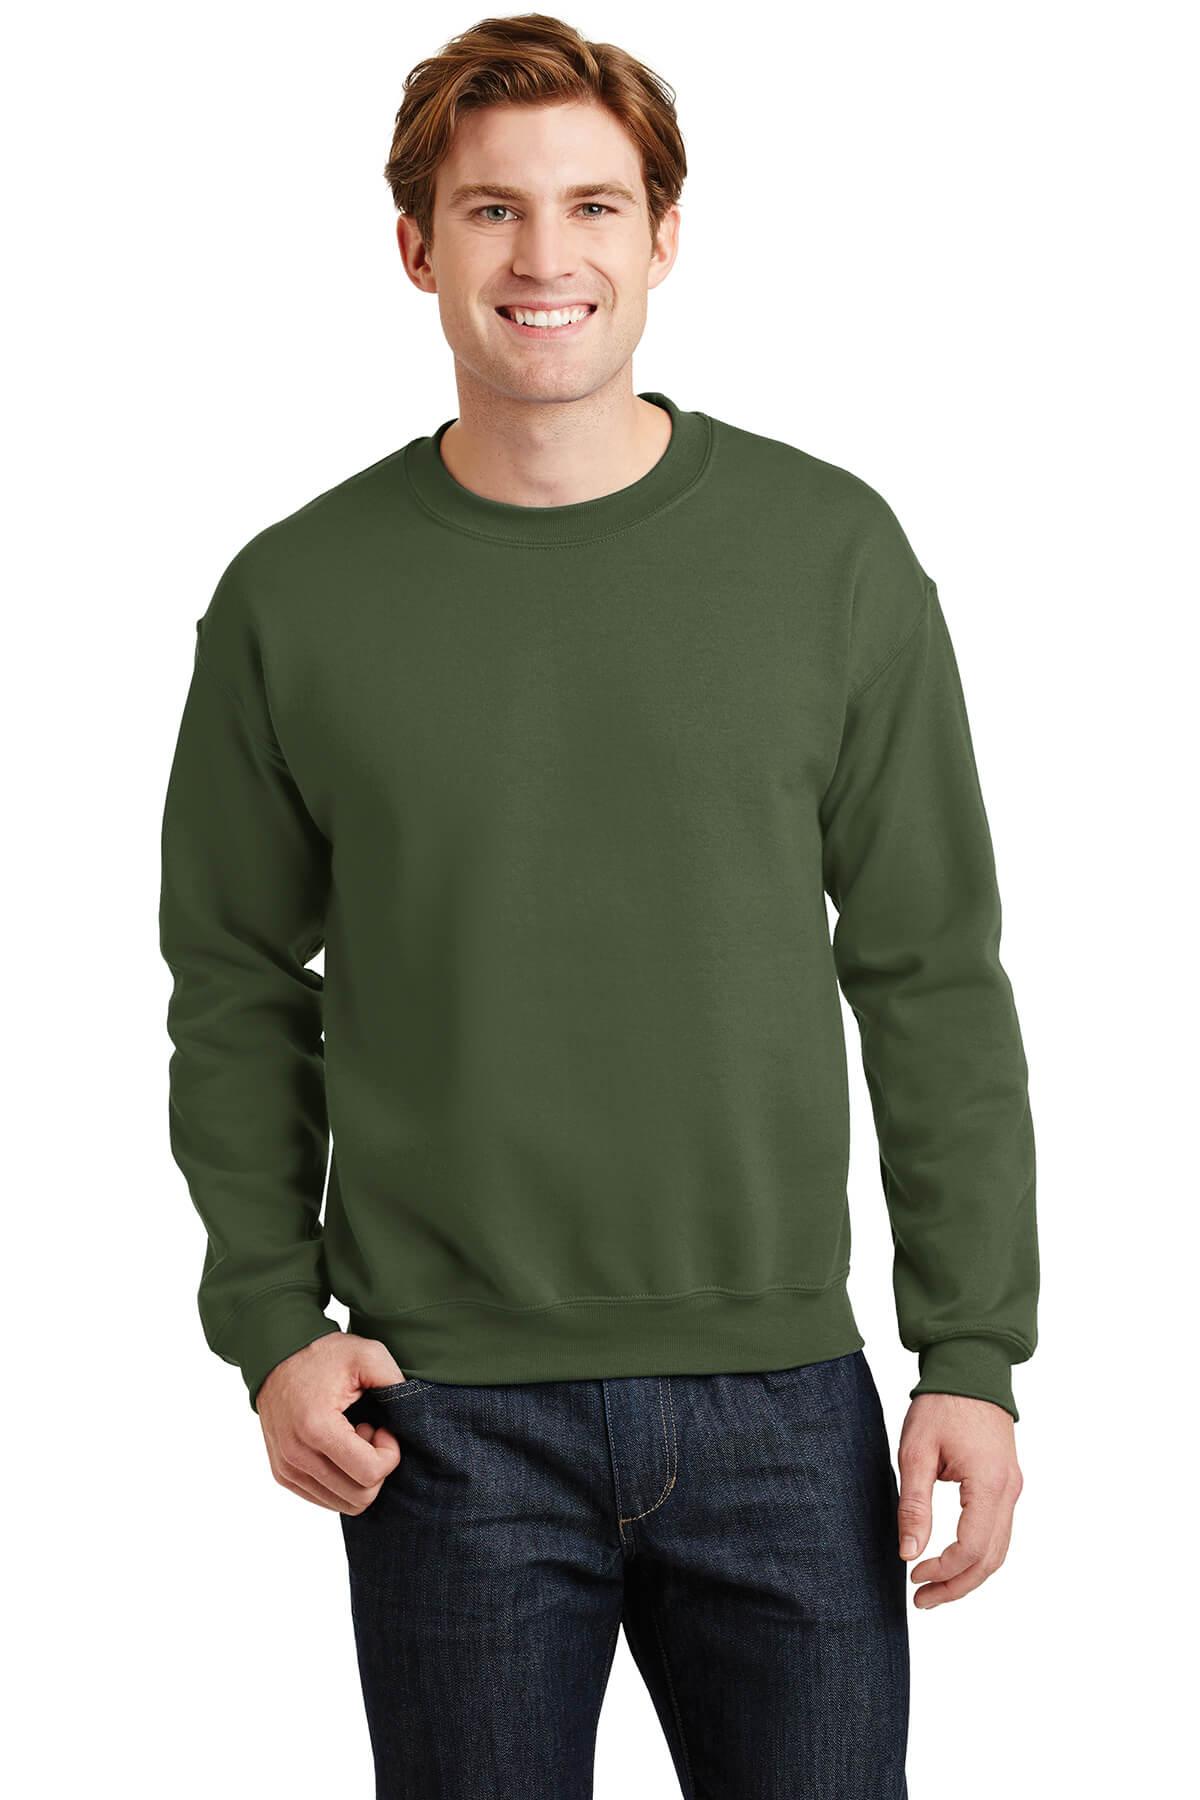 18000-military-green-1